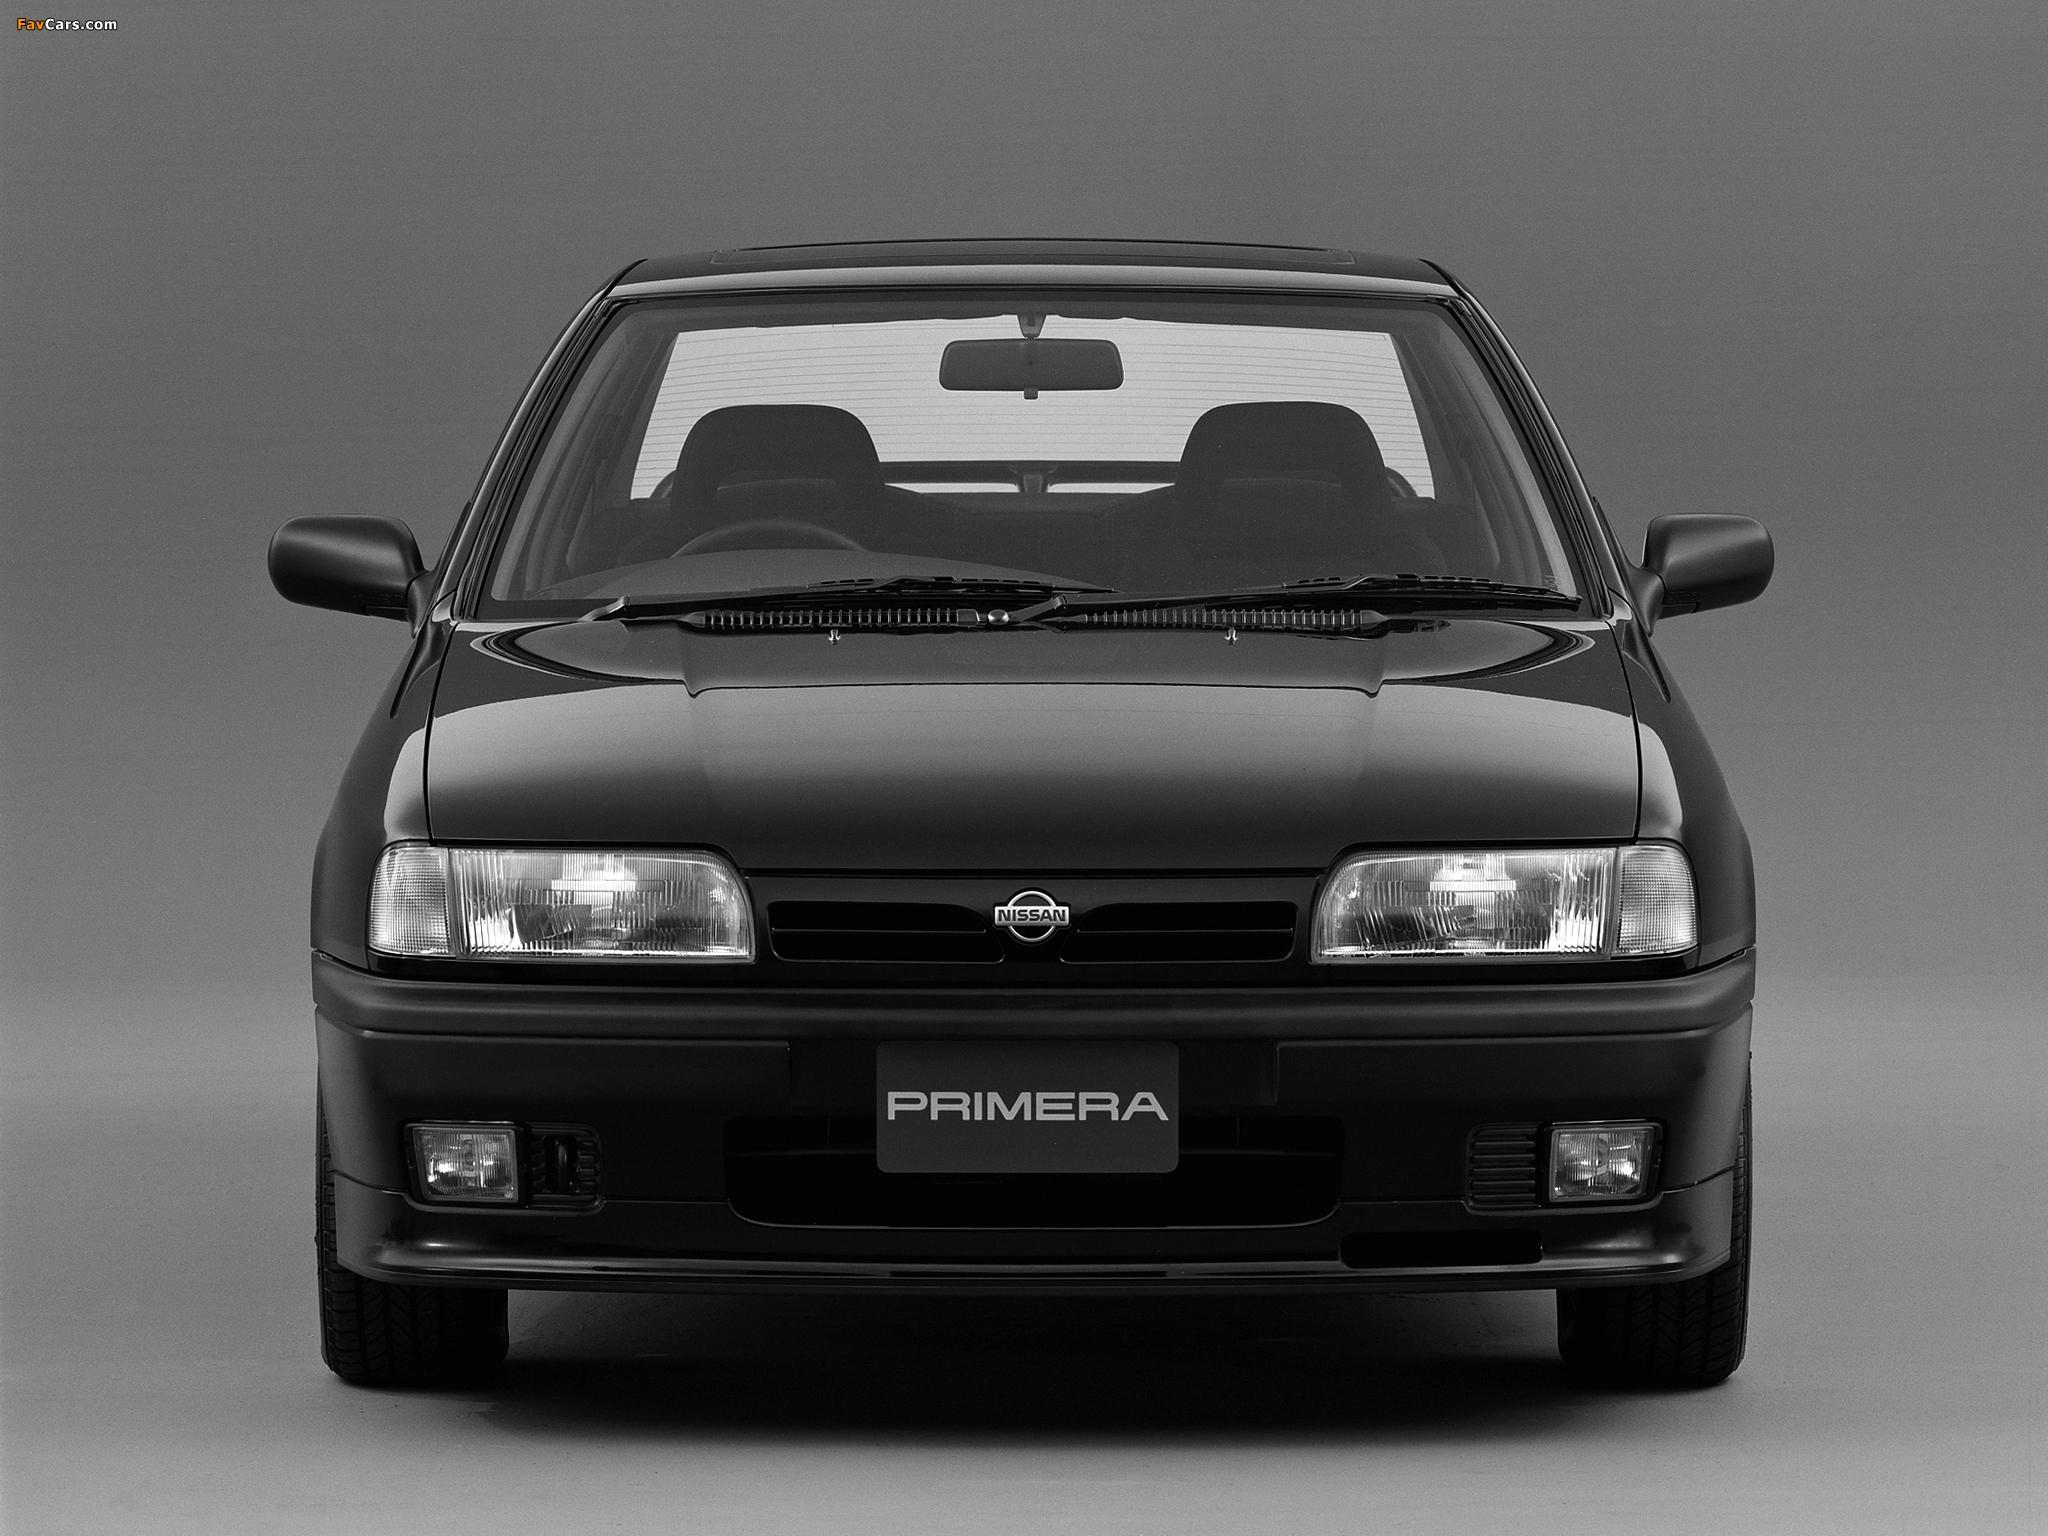 Of nissan primera sedan jp spec p10 199095 photos of nissan primera sedan jp spec p10 199095 vanachro Gallery